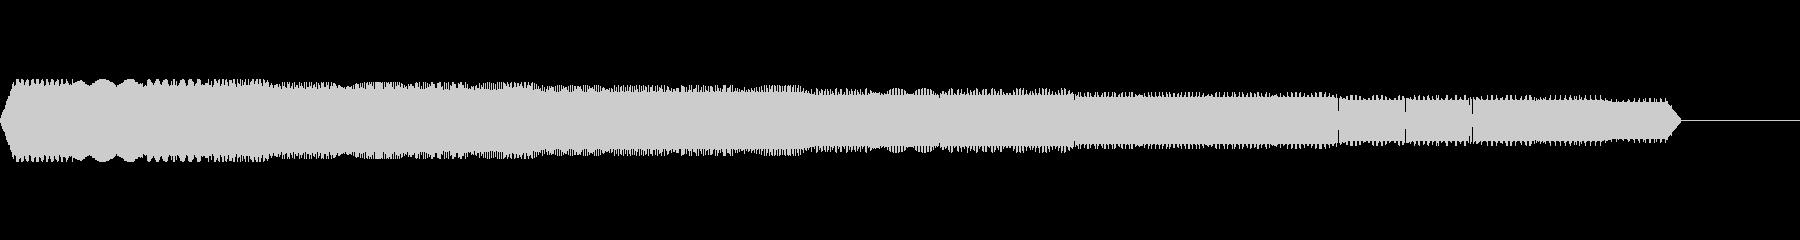 8bitグリッサンド(ピロロロロ↓)02の未再生の波形